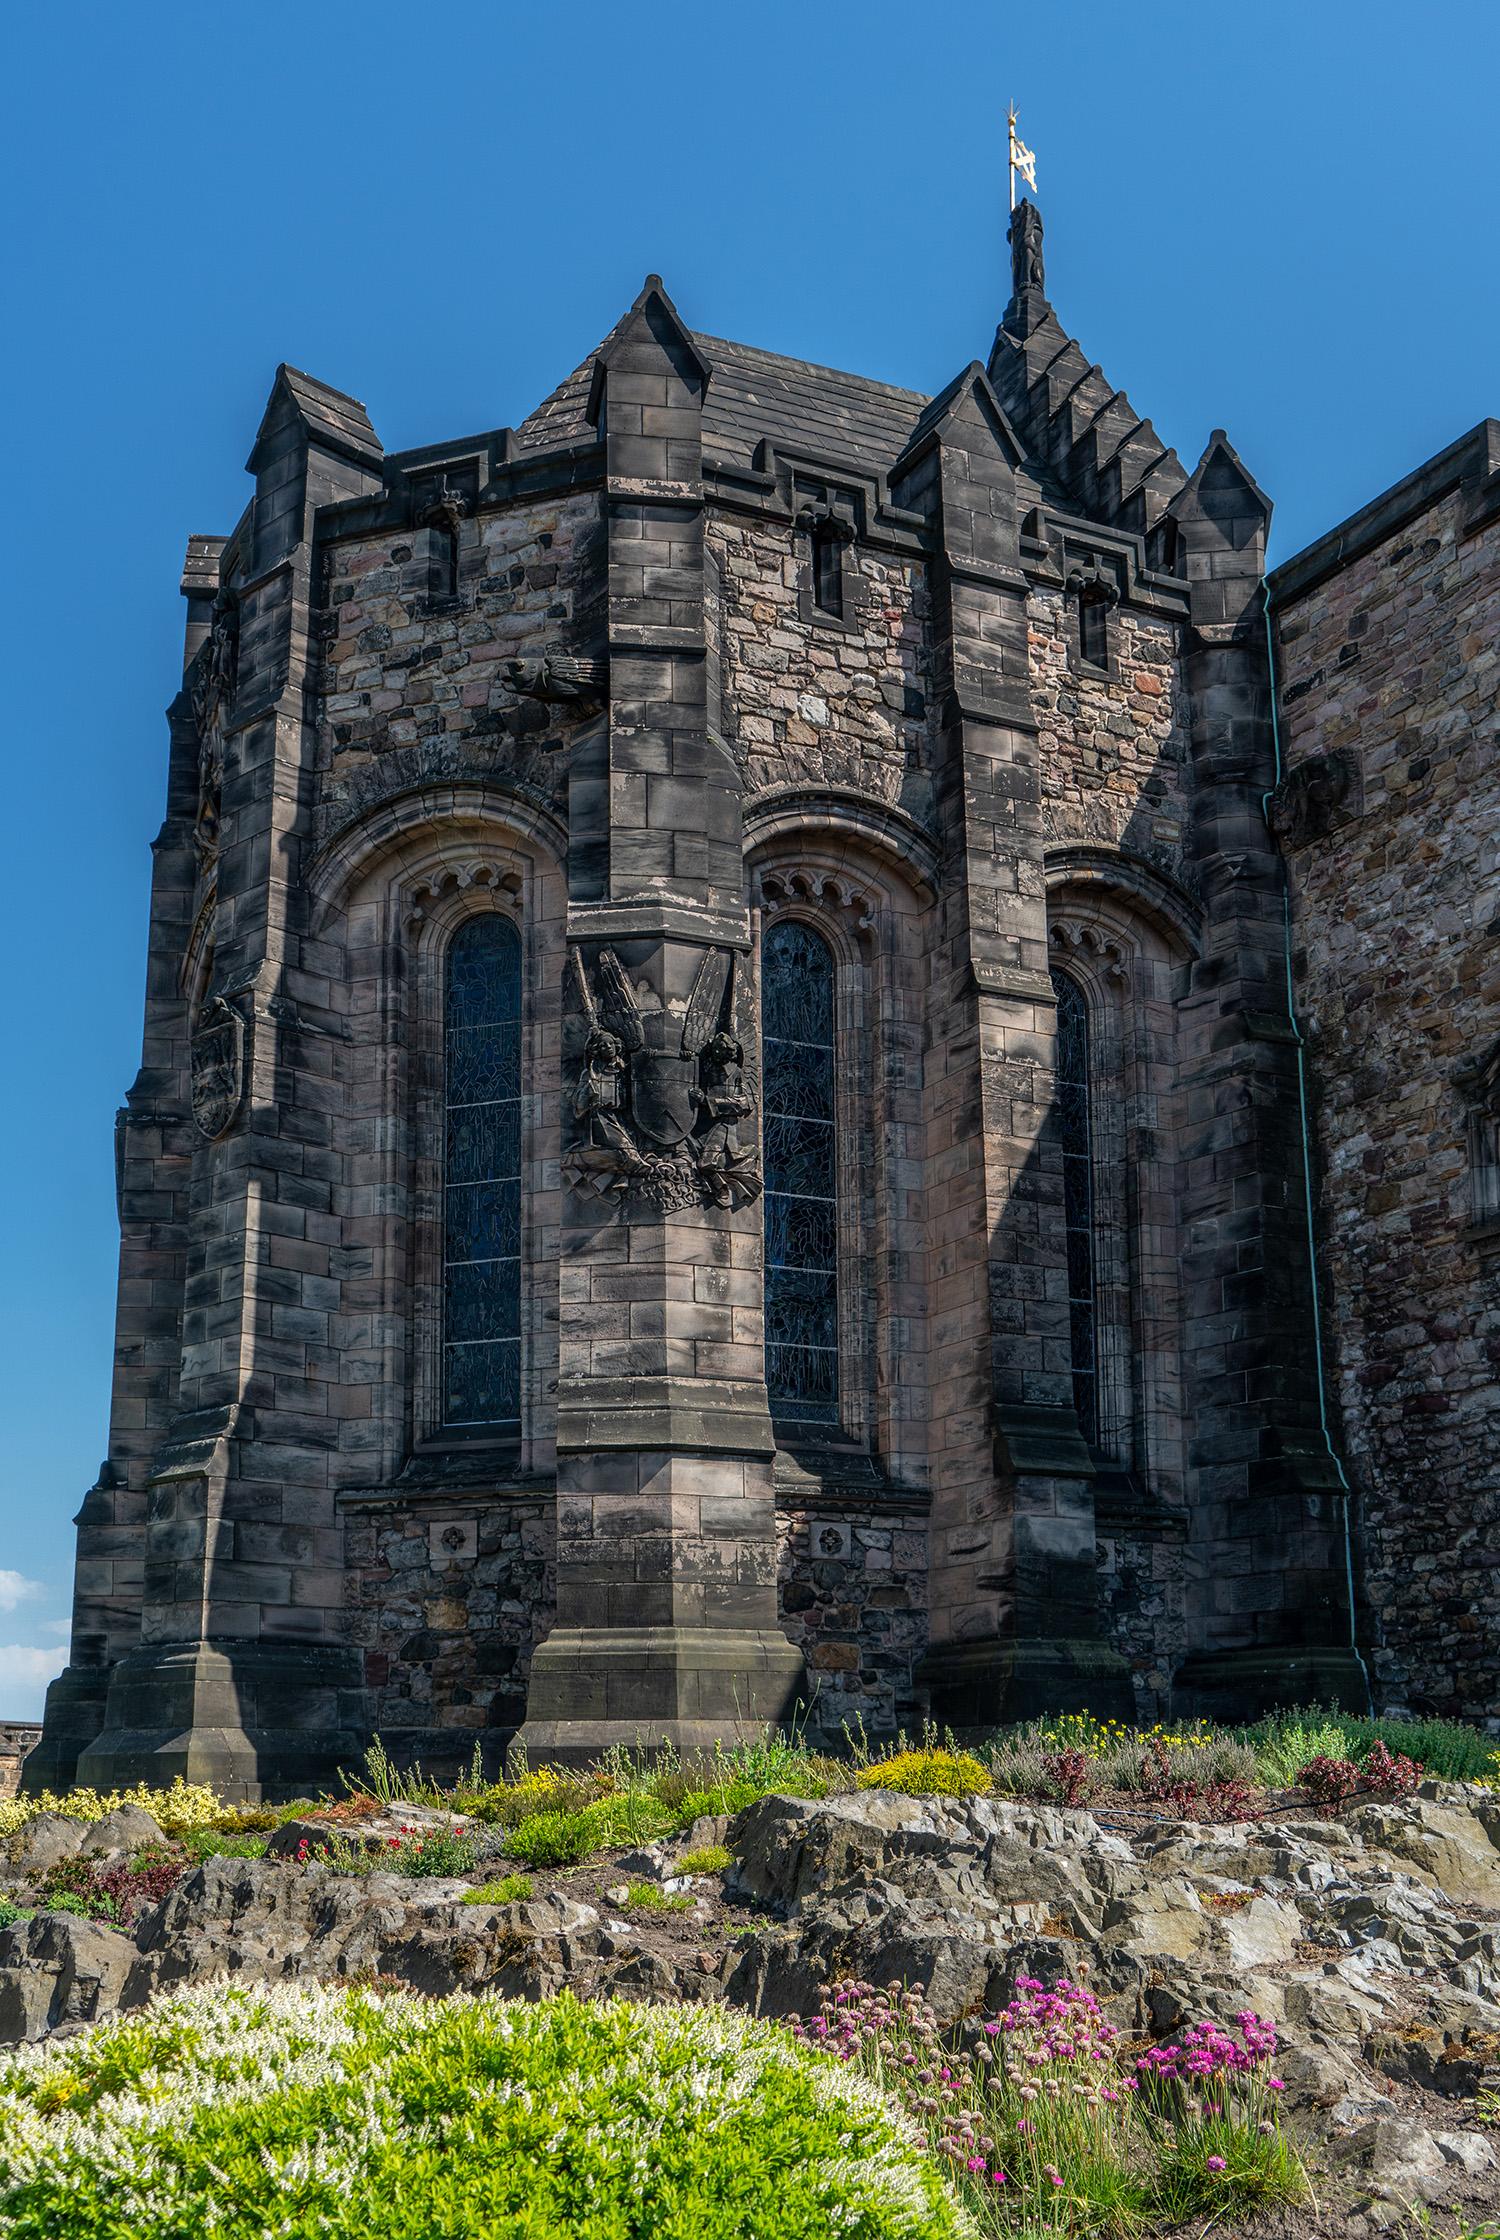 #edinburgh, #castle, #memorial, #scotland, #remembrance, #travel